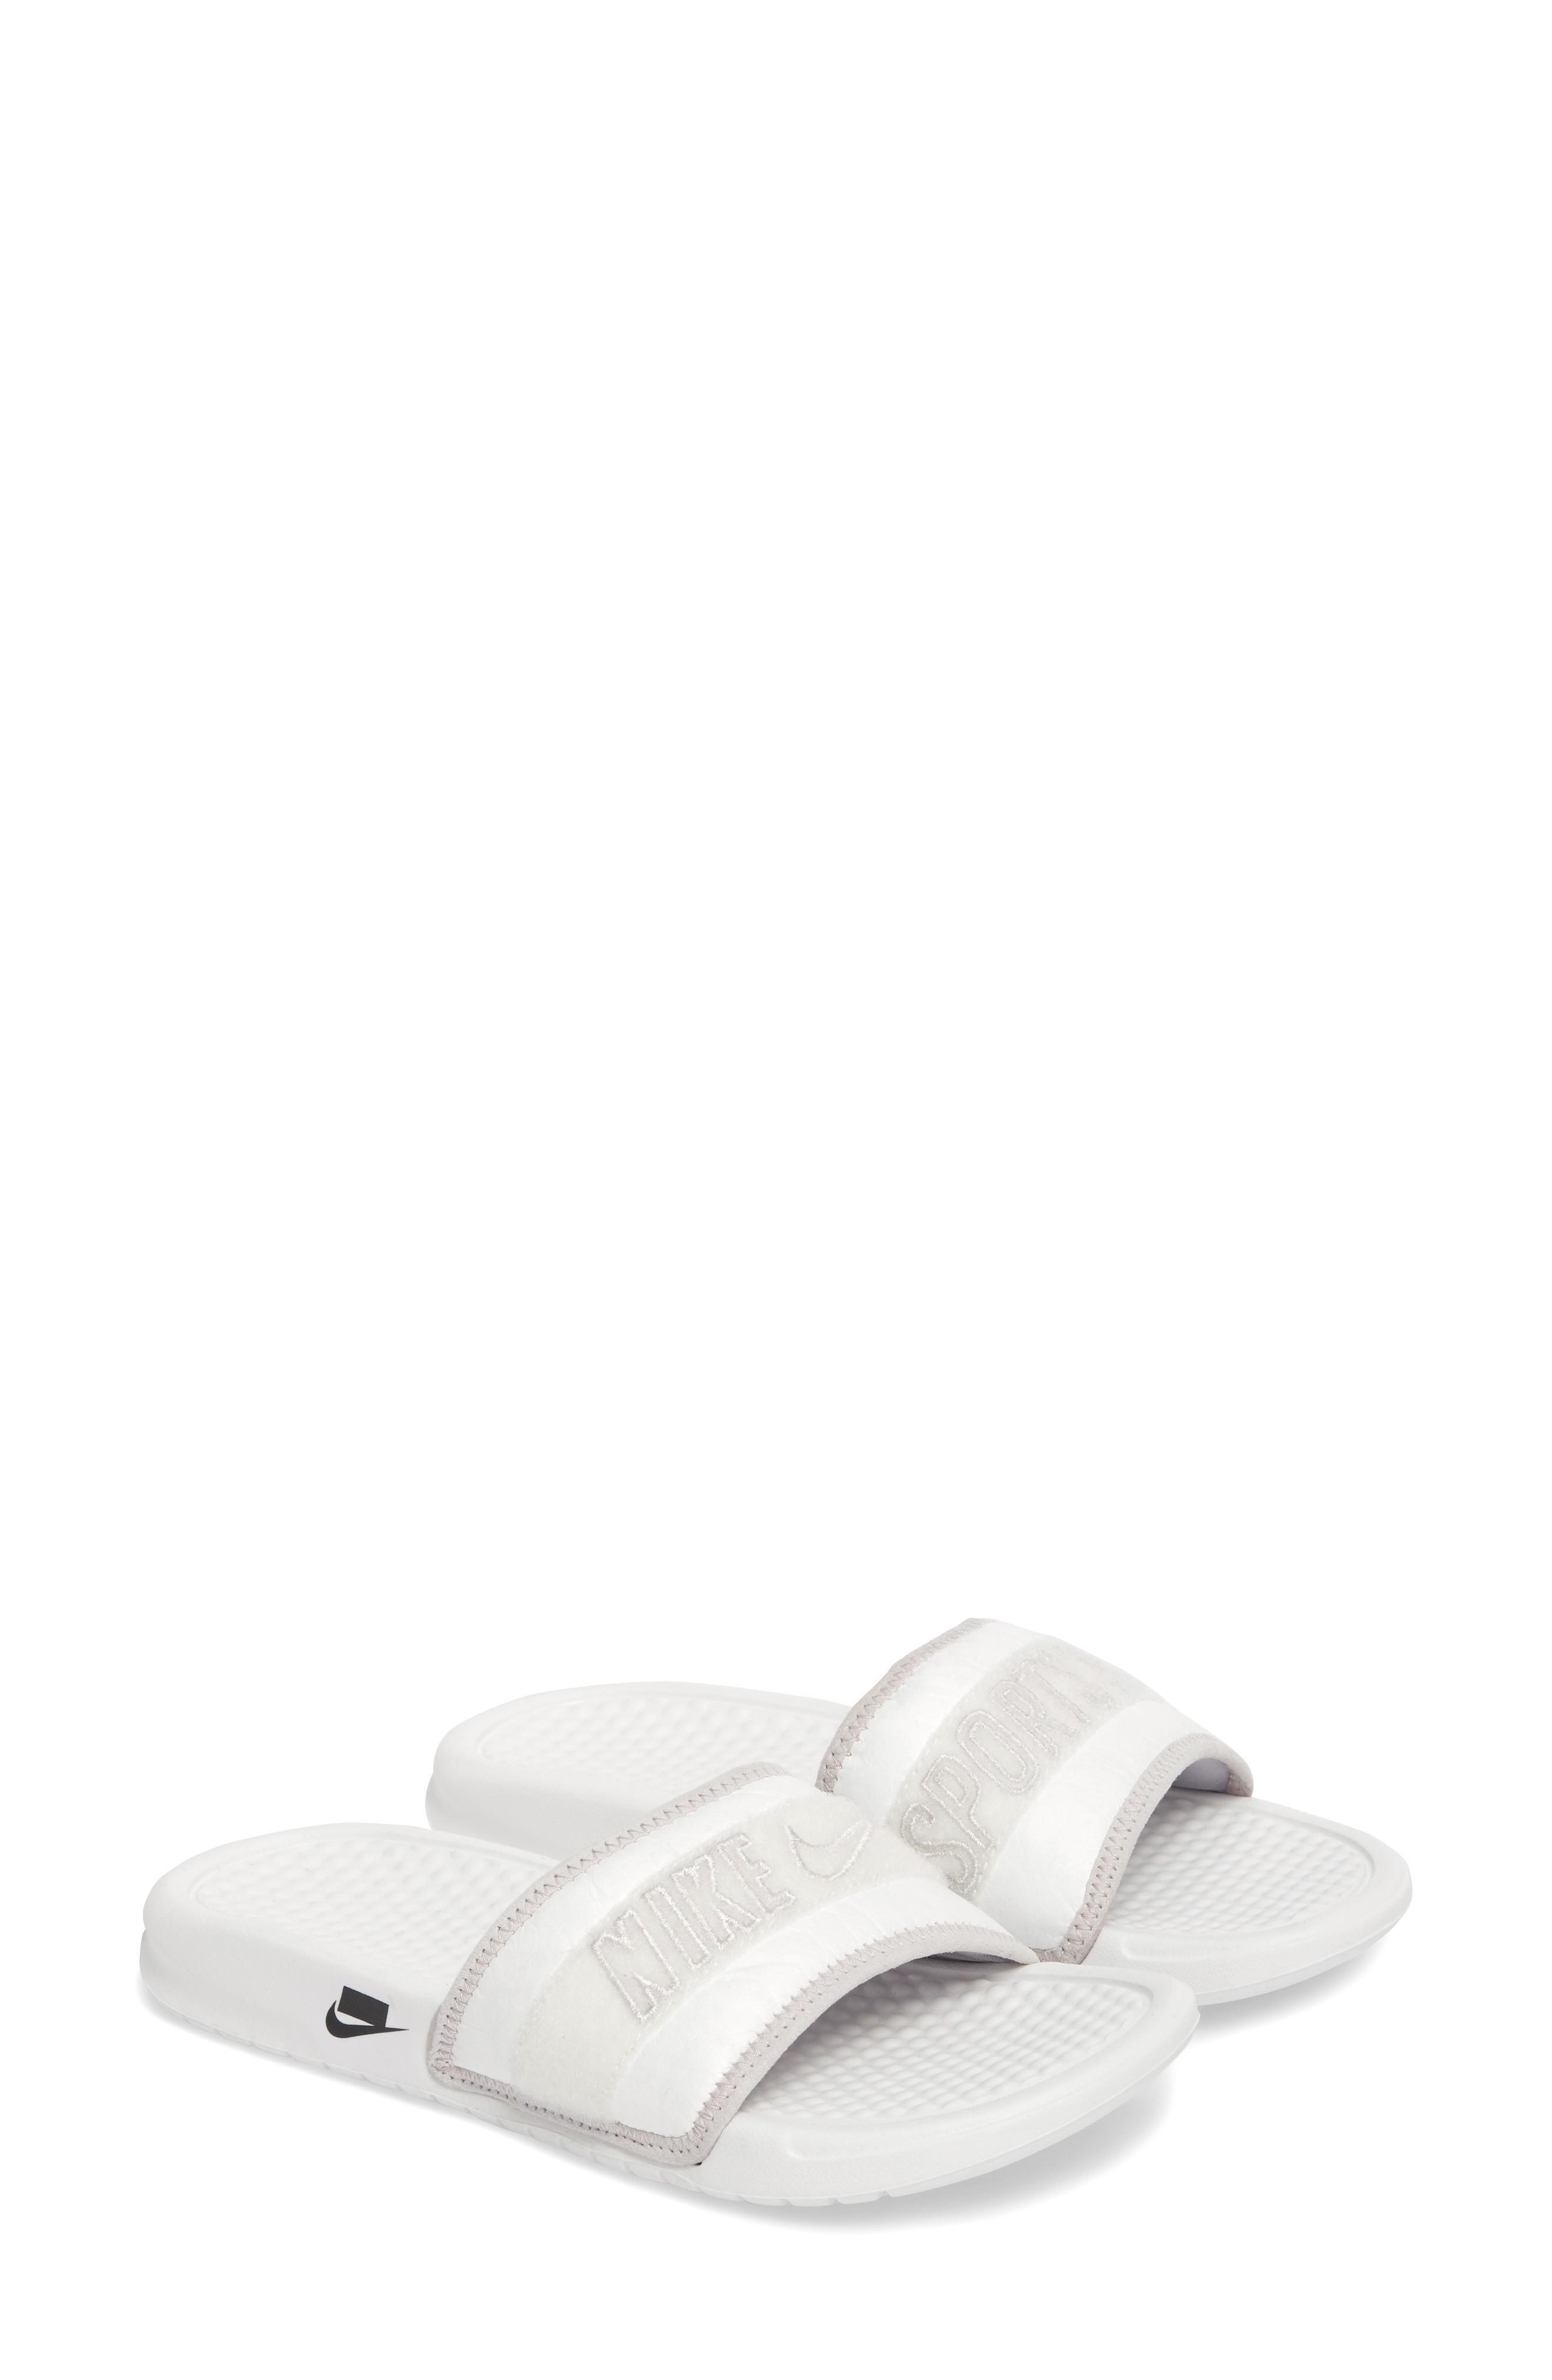 d5e02cf522bb Nike Benassi Jdi Tivek Sport Slide In Summit White  Vast Grey  Black ...